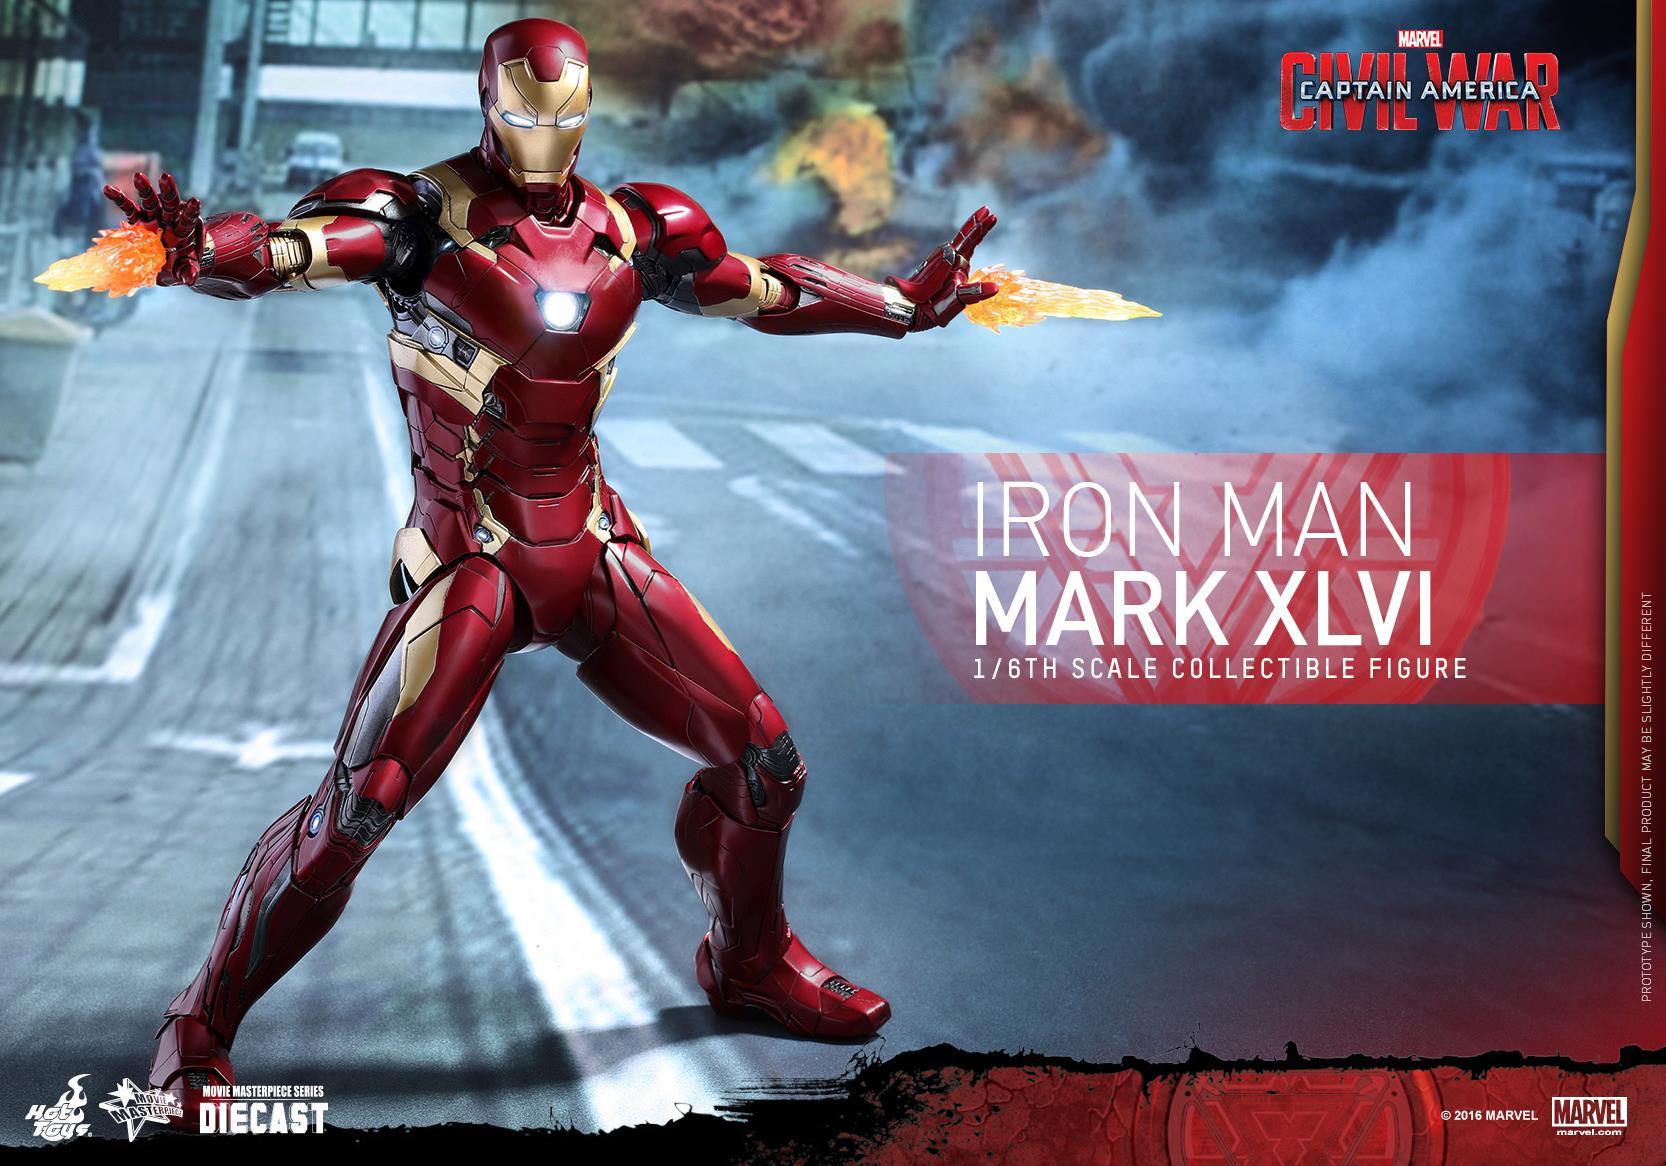 'Spider-Man: Homecoming' adds Robert Downey Jr